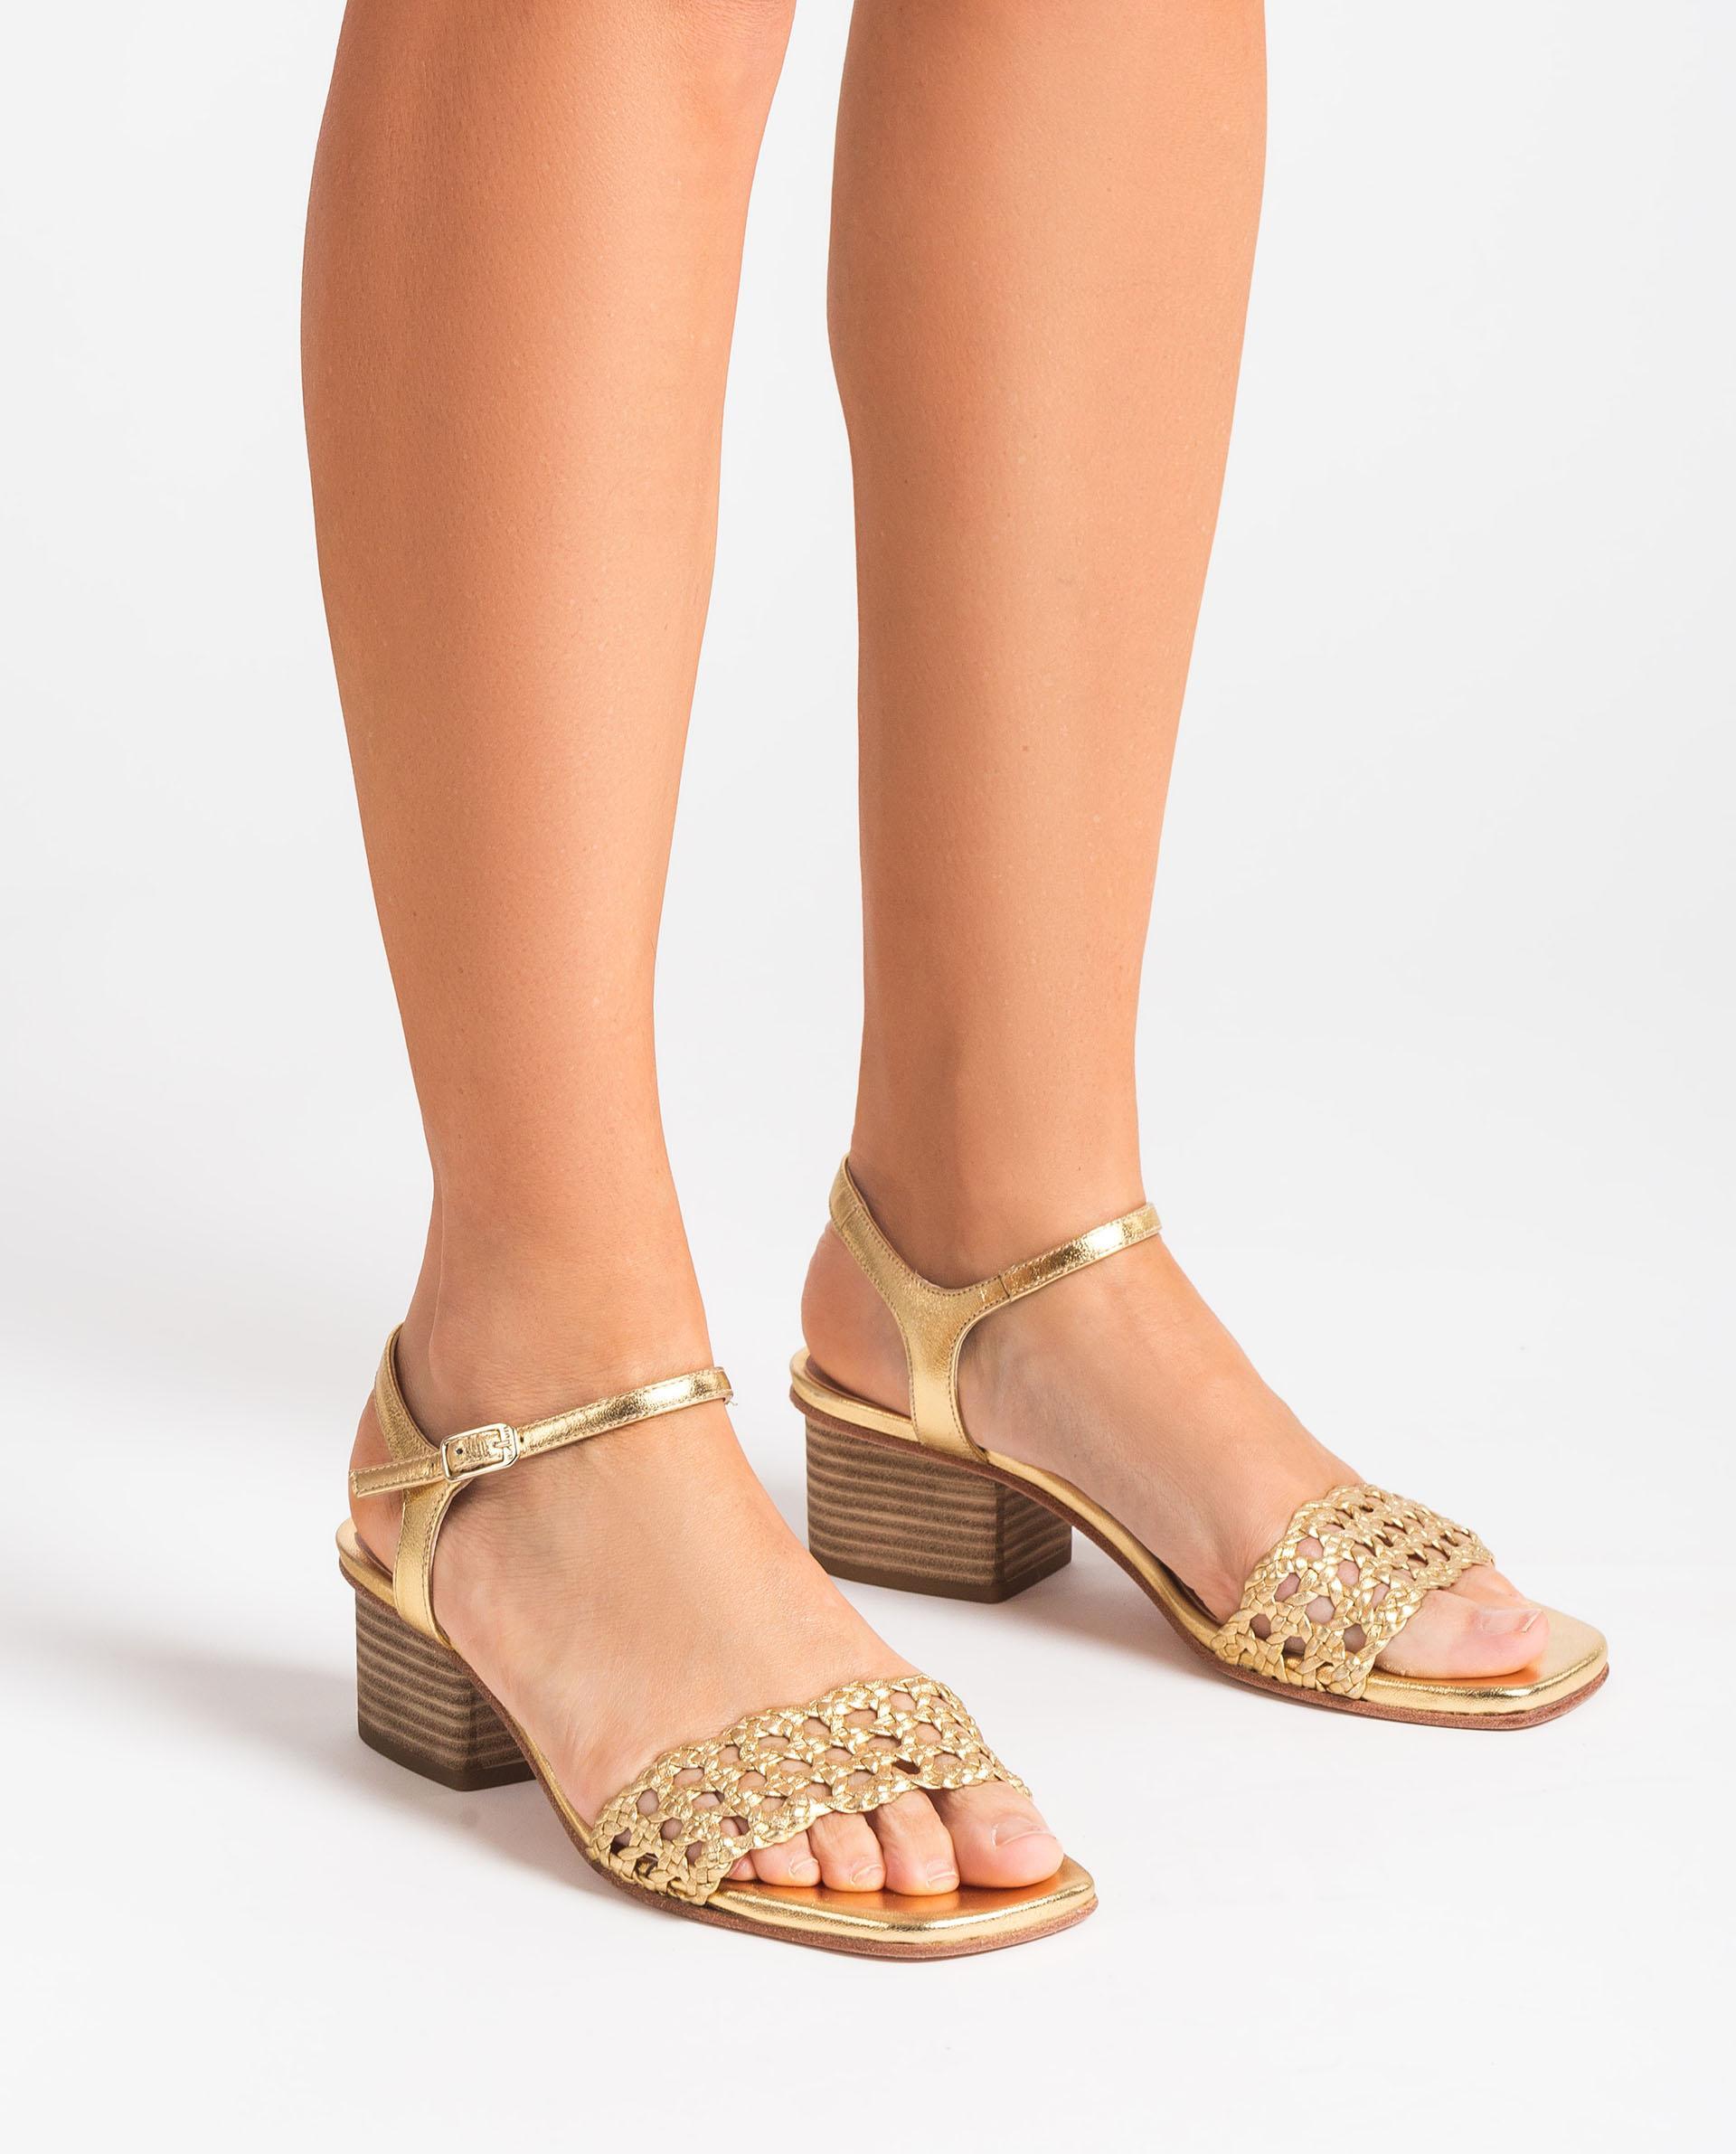 UNISA Braided macramé sandals KEMPIS_LMT 2